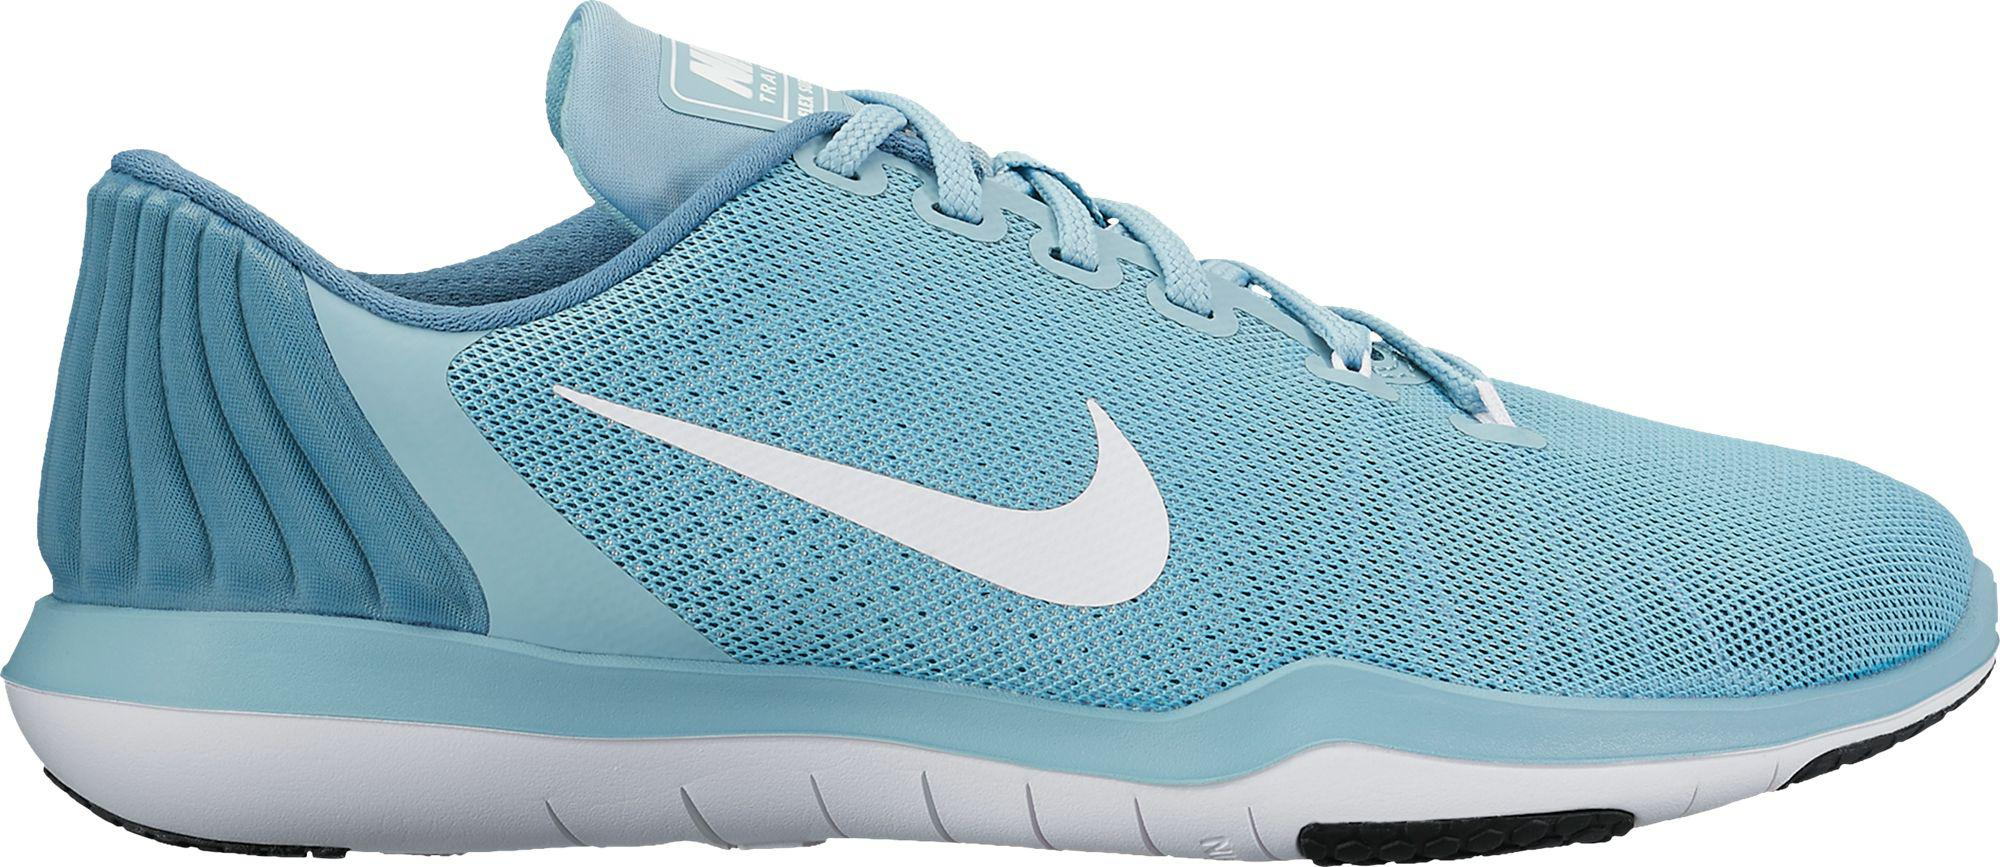 e2ac0090d33b3 Lyst - Nike Flex Supreme Tr 5 Training Shoes in Blue